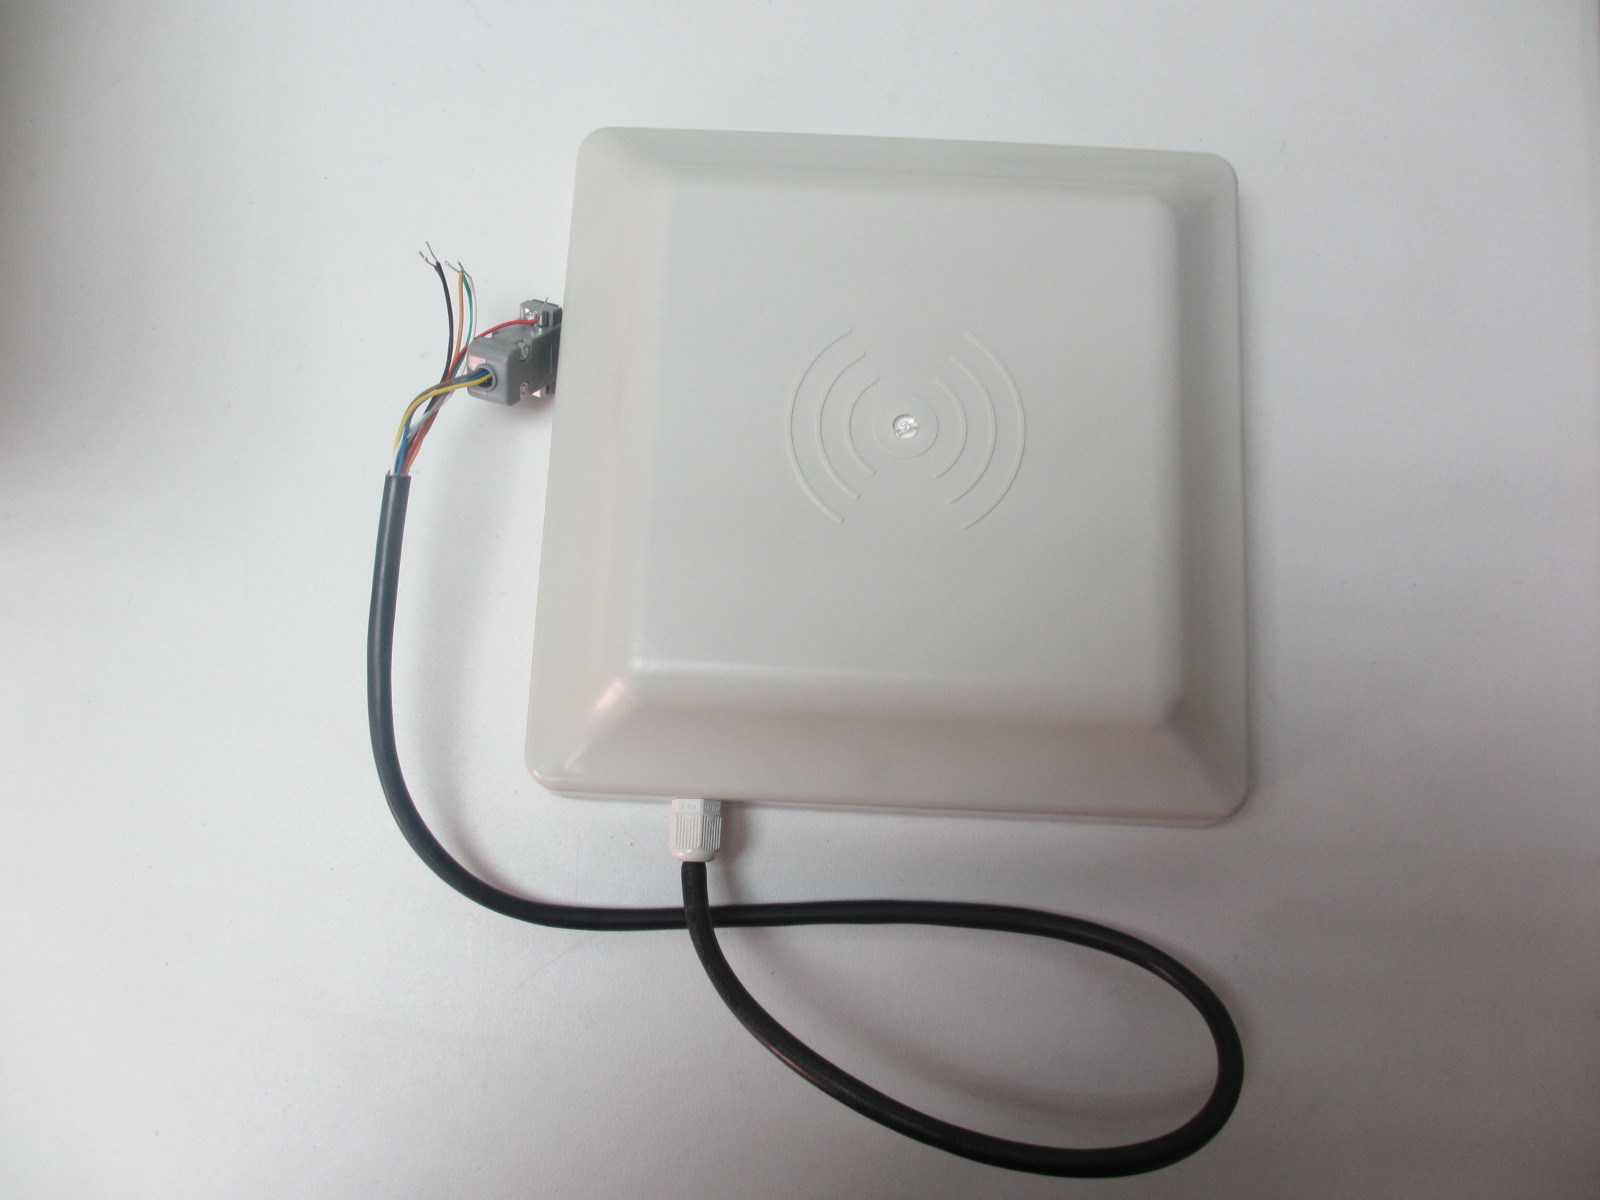 15m Long Distance Wiegand RFID UHF Card Reader (JYA-LR0703)